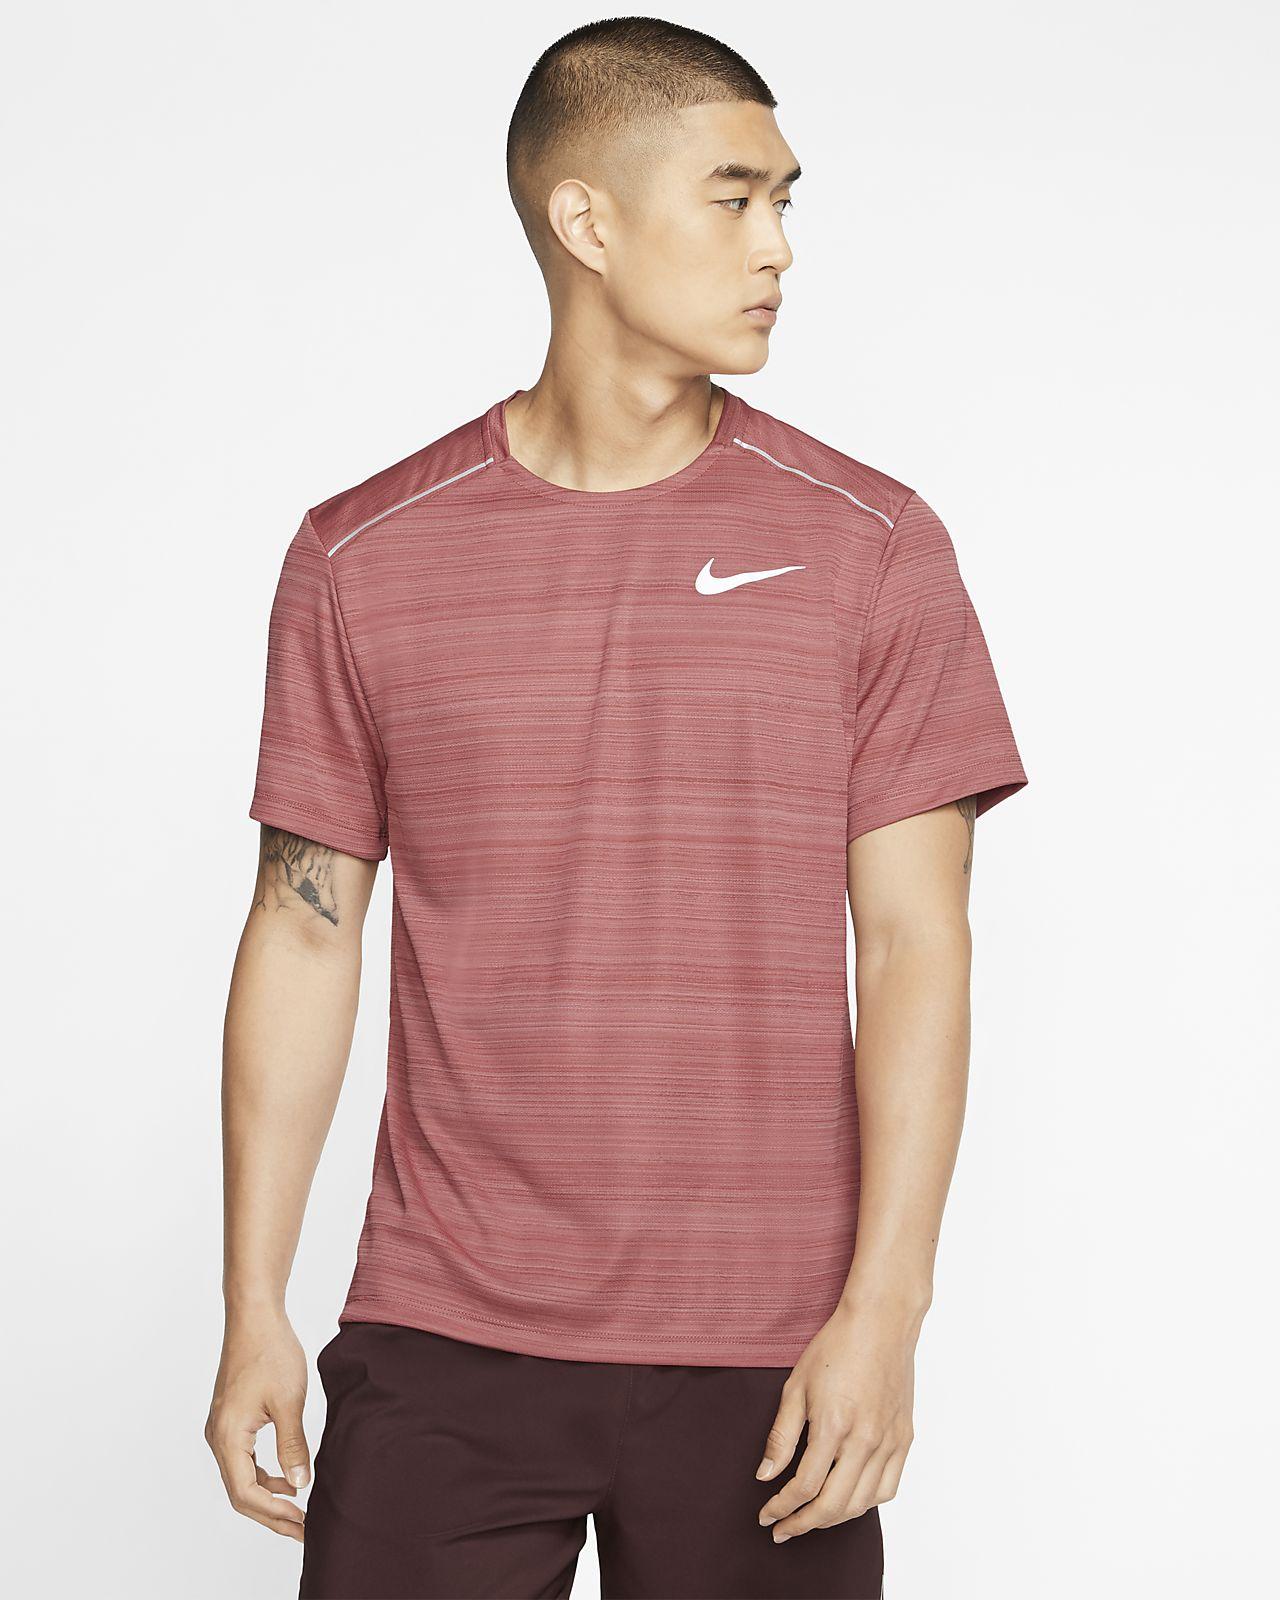 Camisola de running de manga curta Nike Dri-FIT Miler para homem